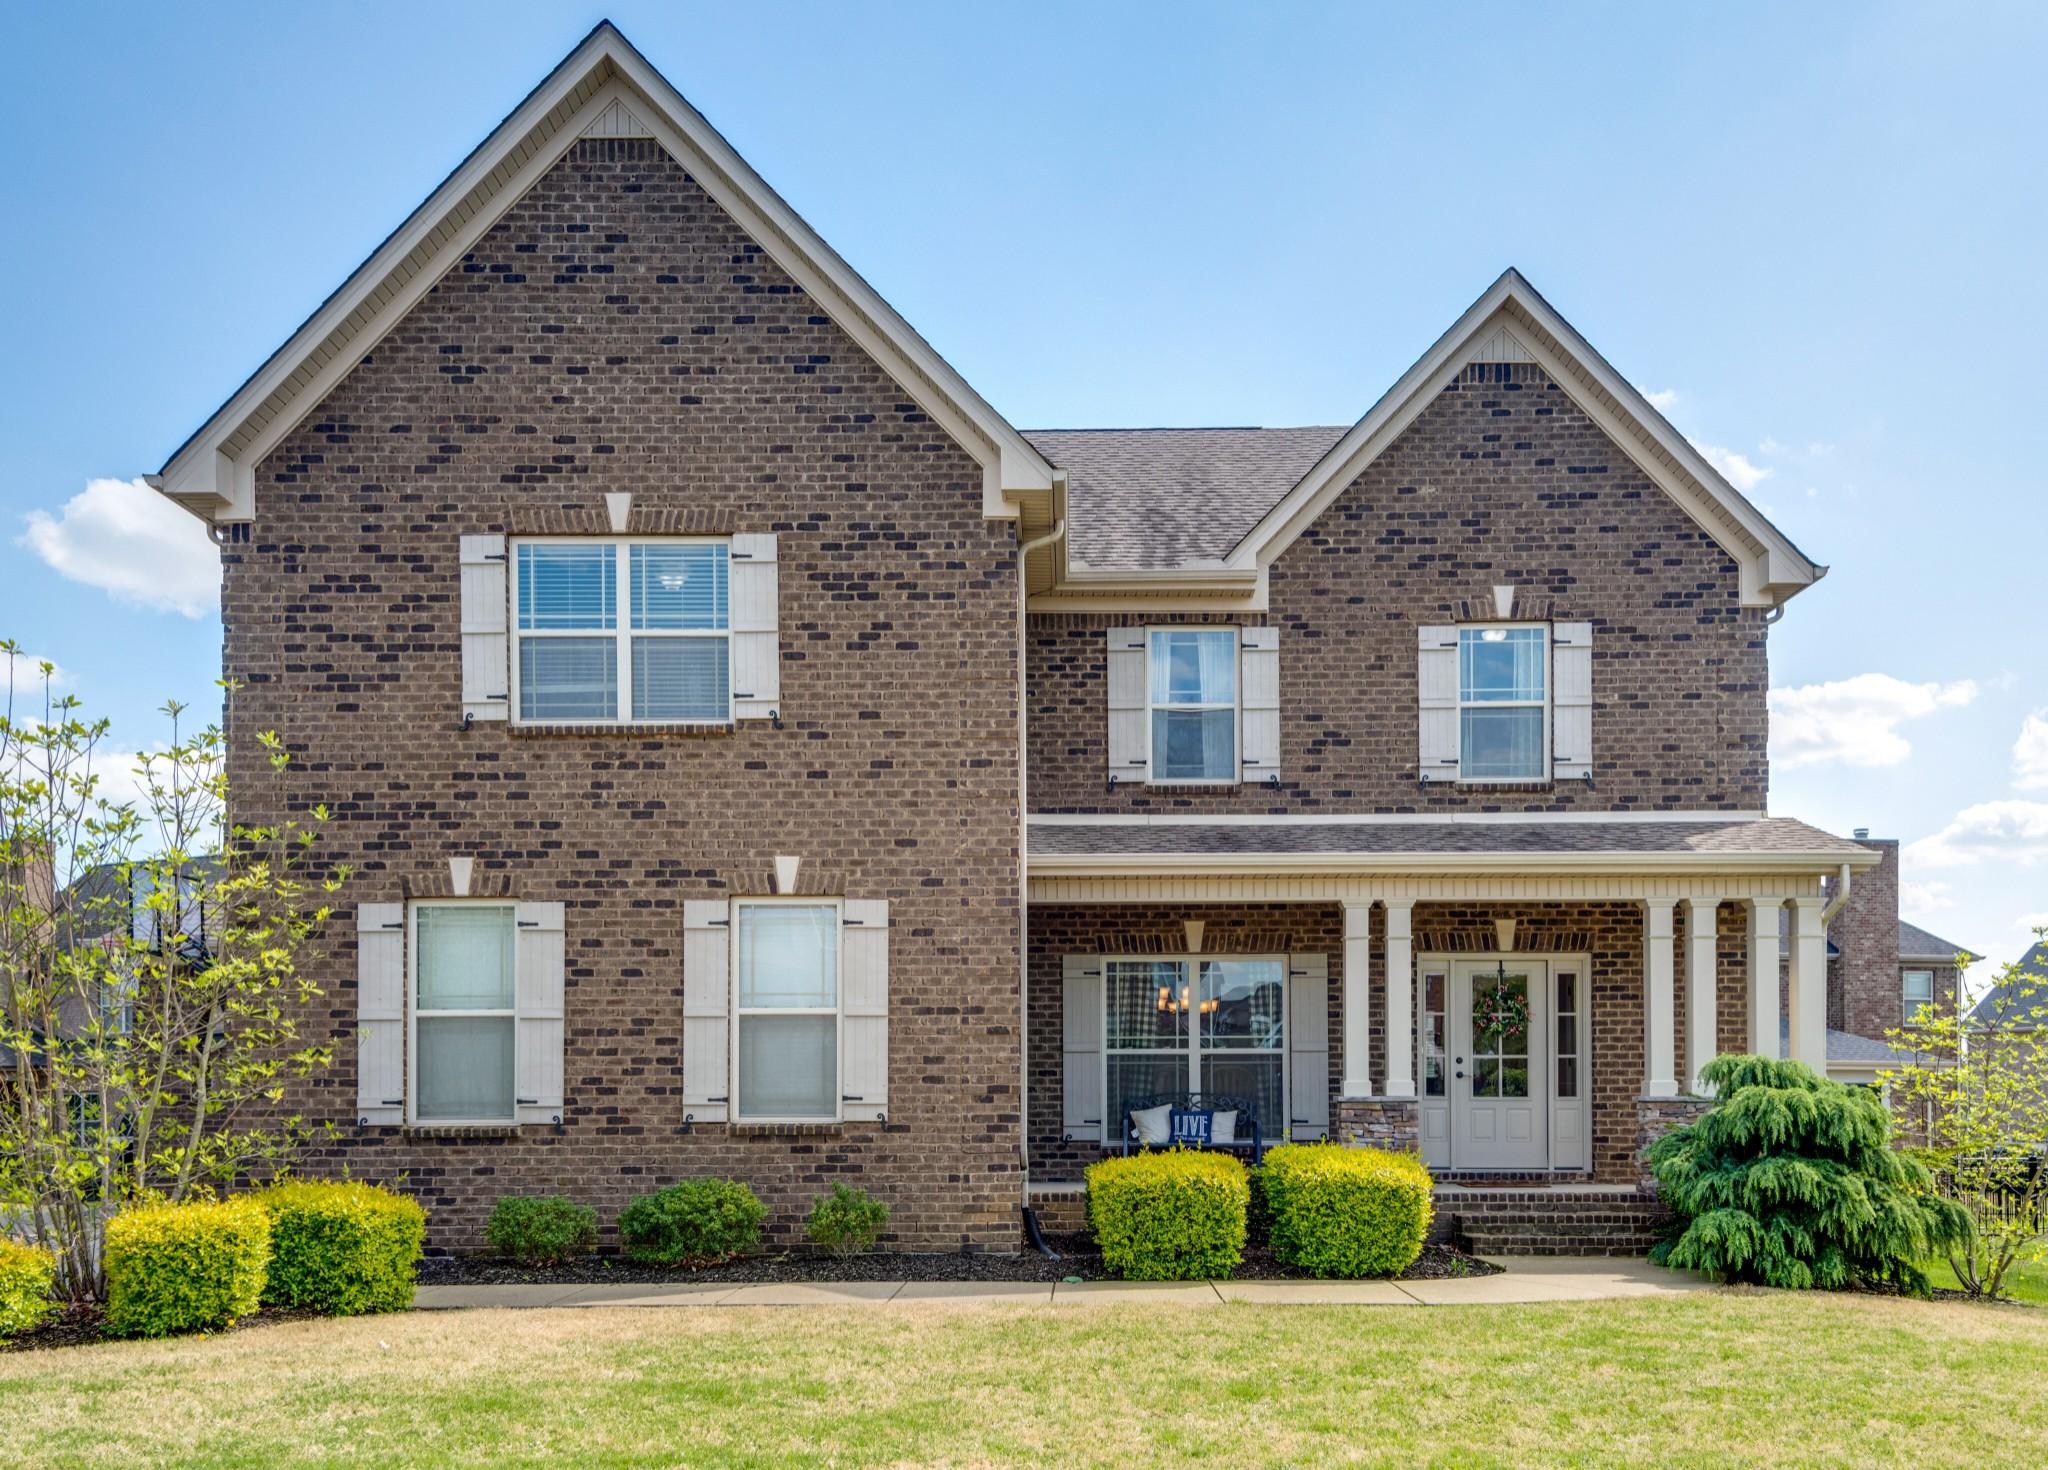 4008 Gari Baldi Ct Property Photo - Spring Hill, TN real estate listing